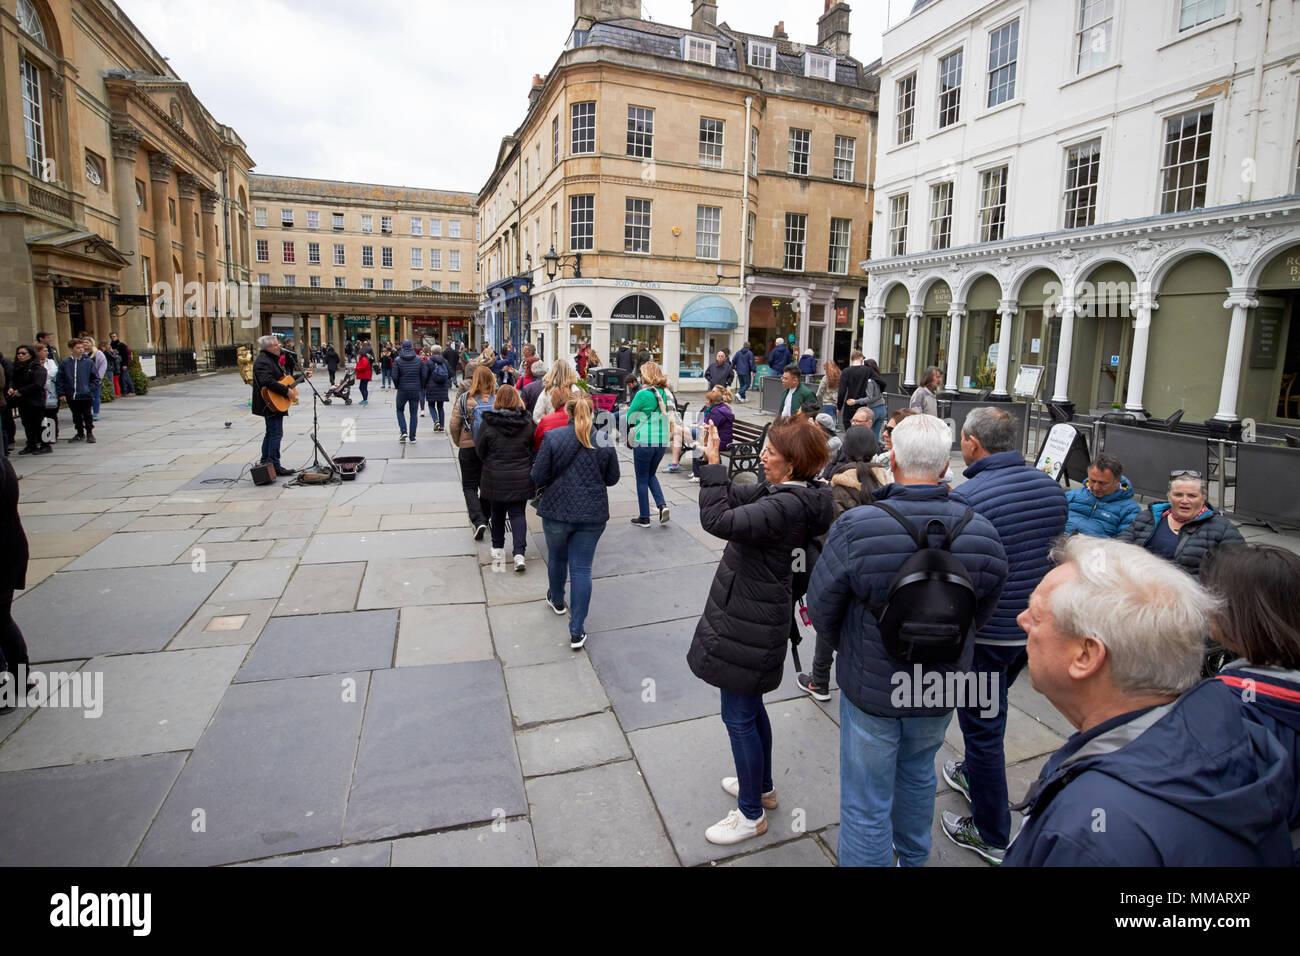 tourists on walking tour of bath walk through abbey churchyard Bath England UK - Stock Image